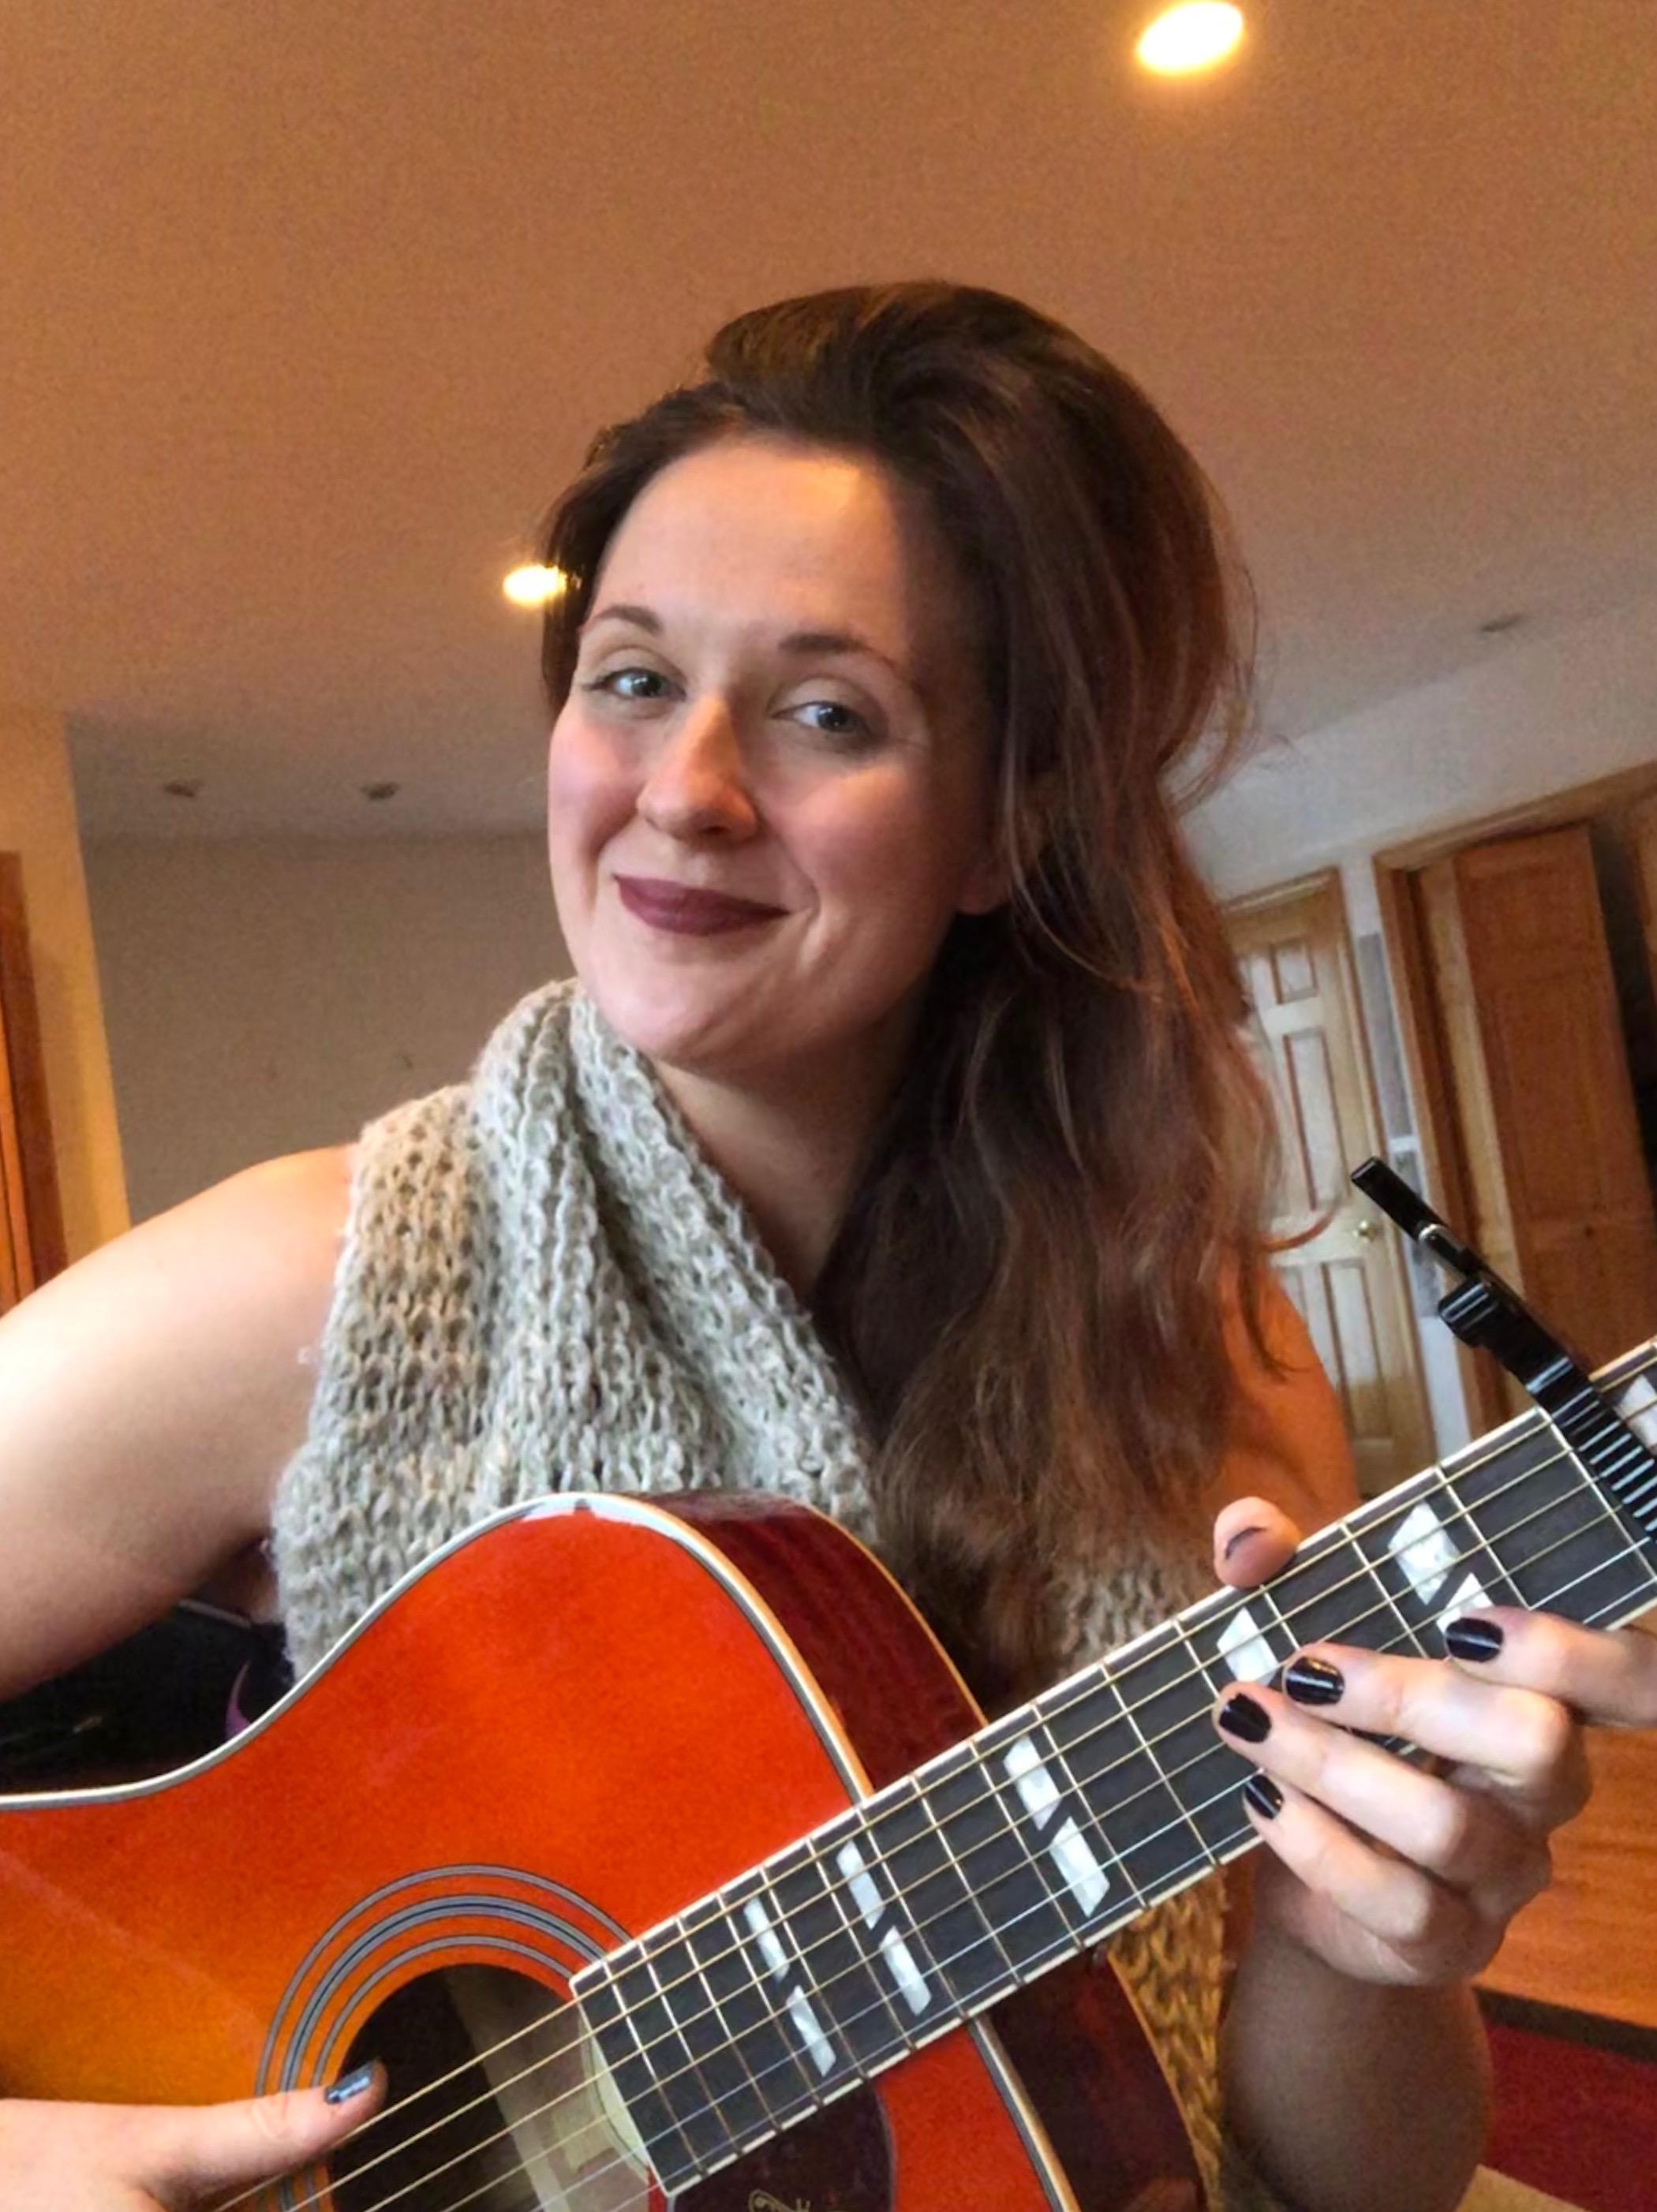 Jessica Zdanys - 200 hour Yoga Teacher & Songwriter/Musician